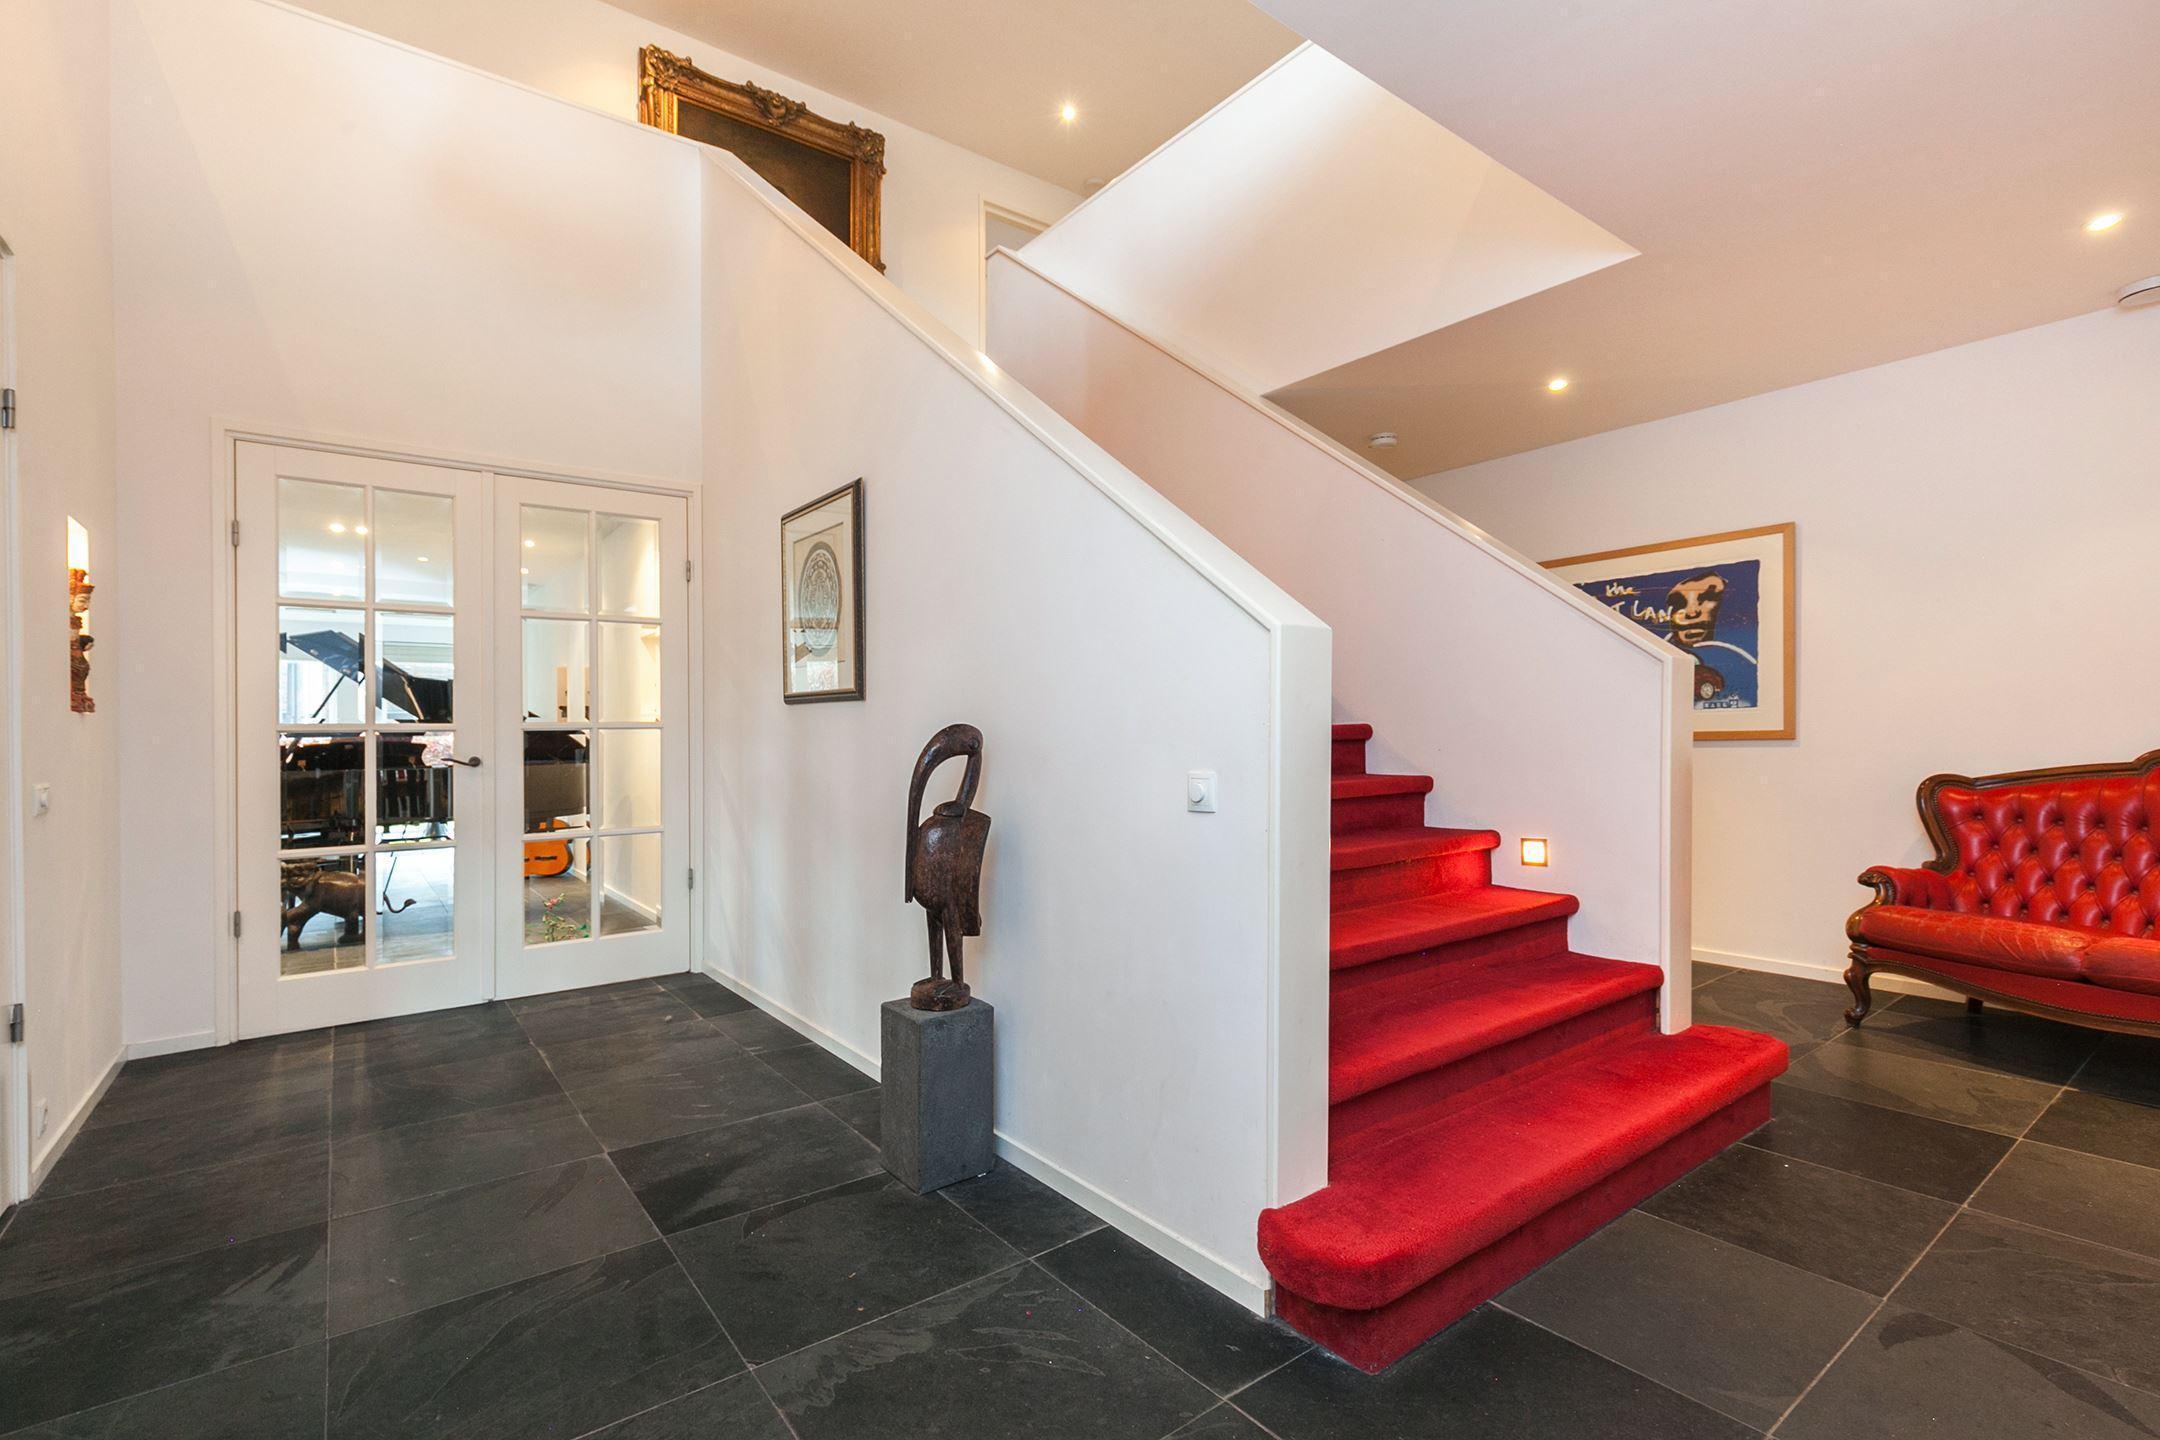 Te koop in assen riante villa met dubbele garage for Funda dubbele bewoning